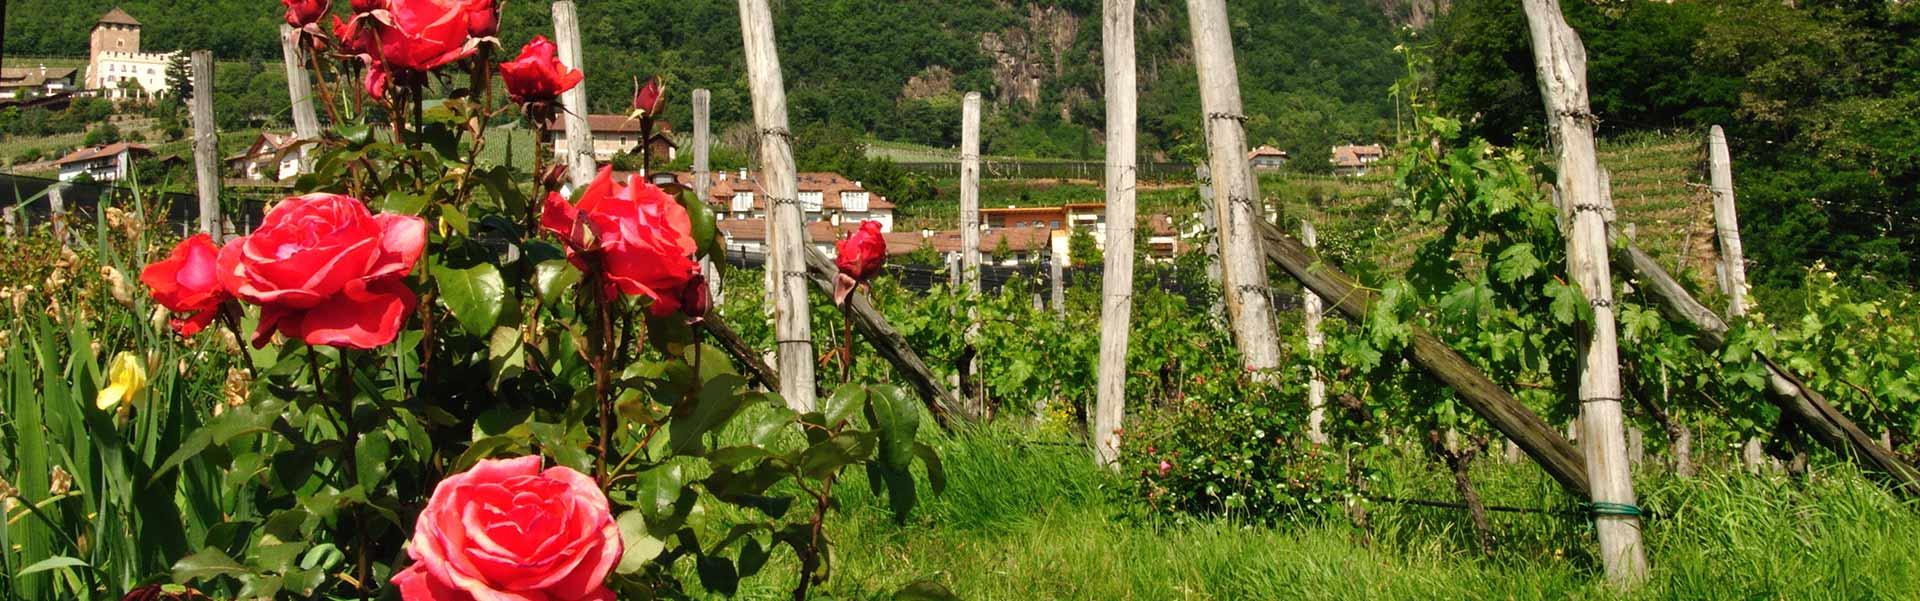 Weinkellerei Meraner Südtirol Meran Neustift